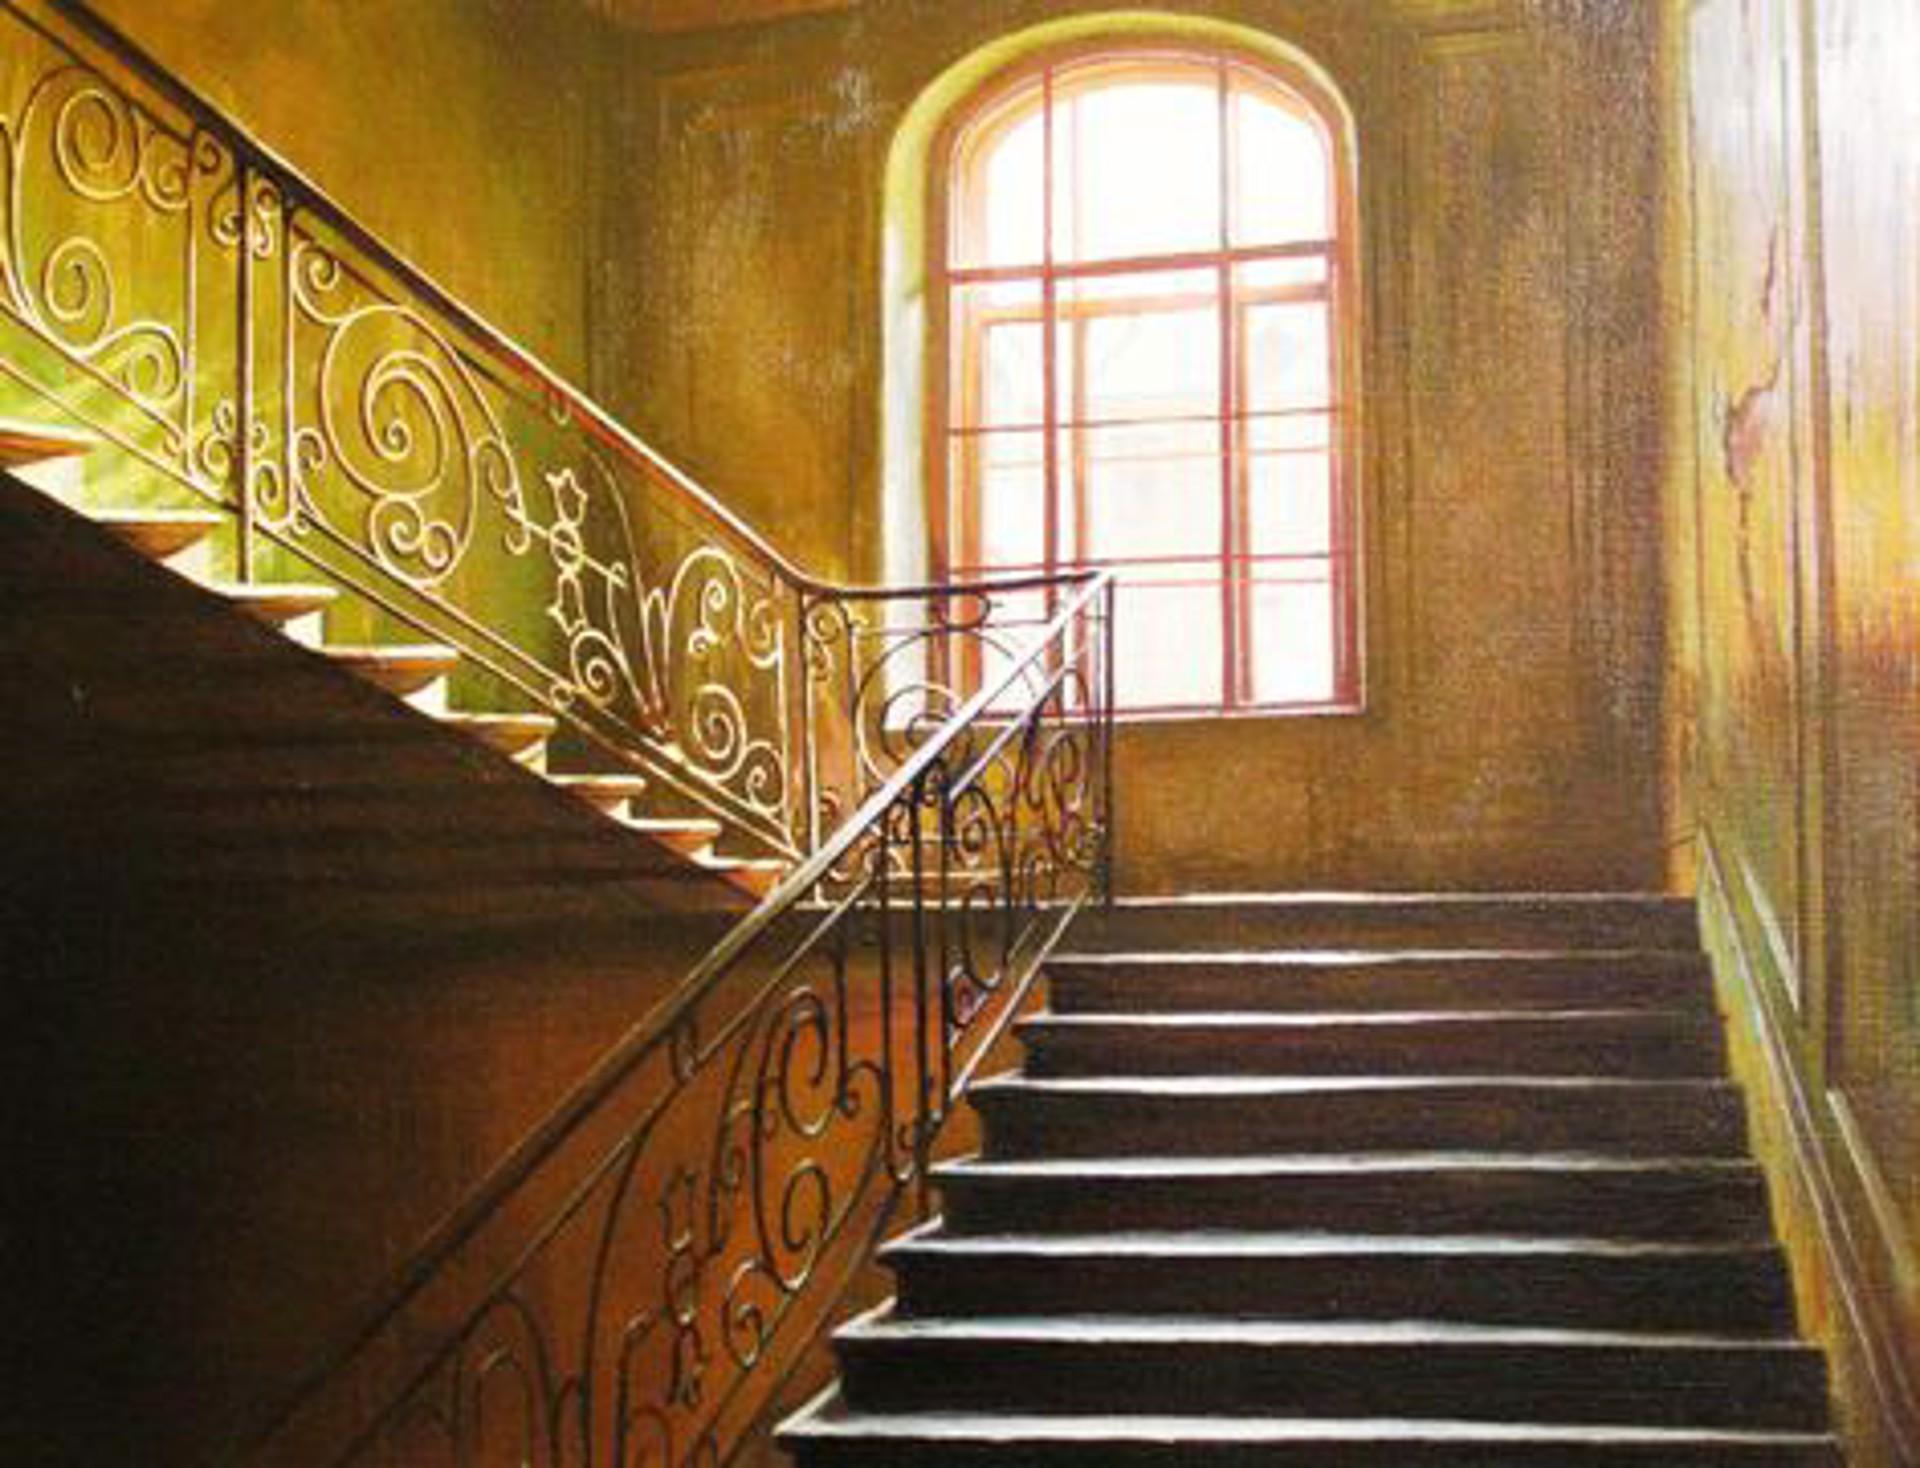 Stairs I Climb by Alexei Butirskiy